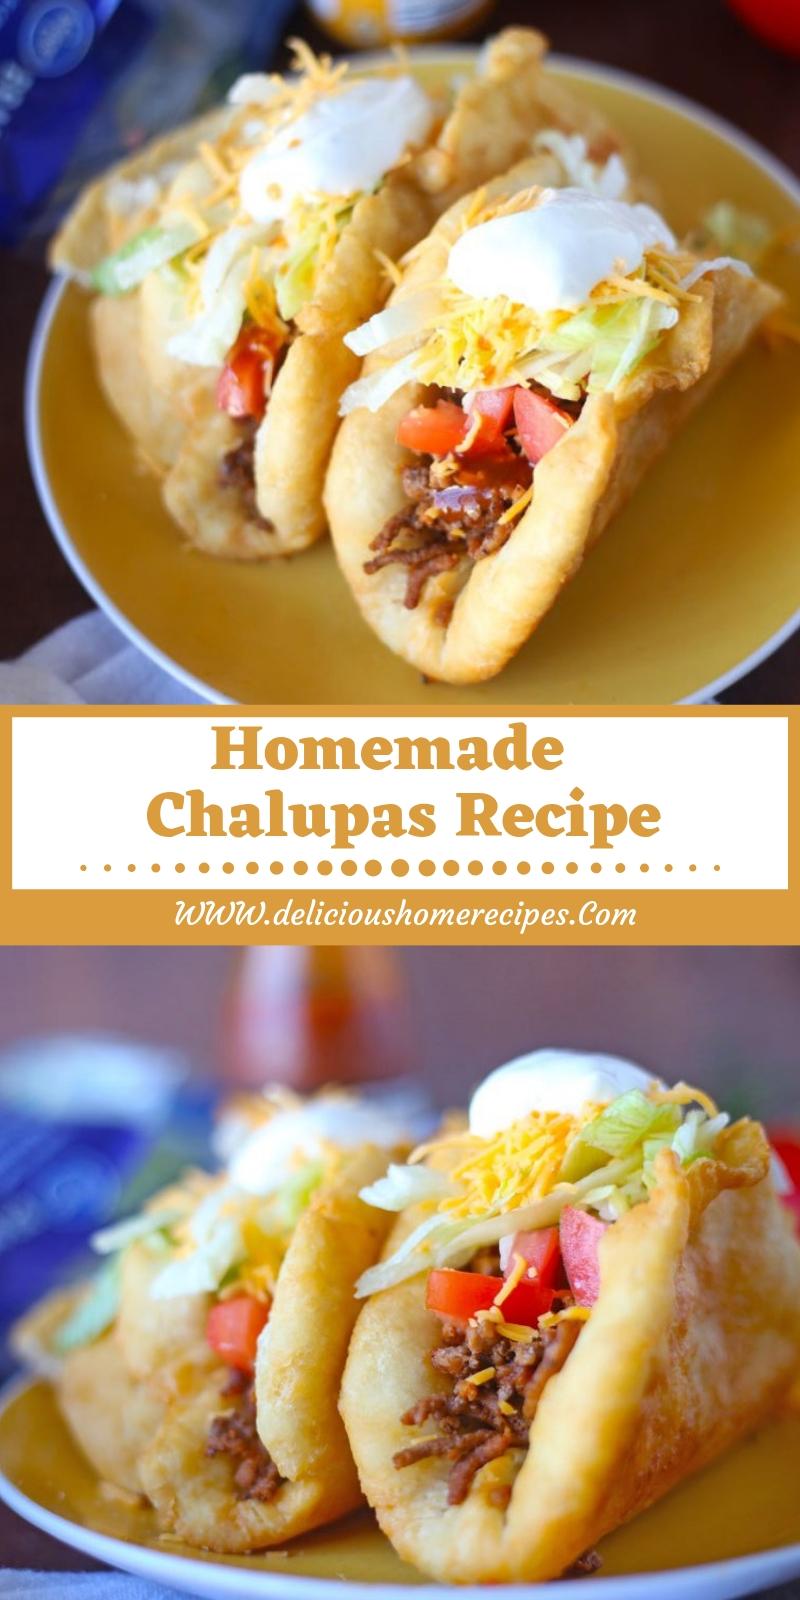 Homemade  Chalupas Recipe